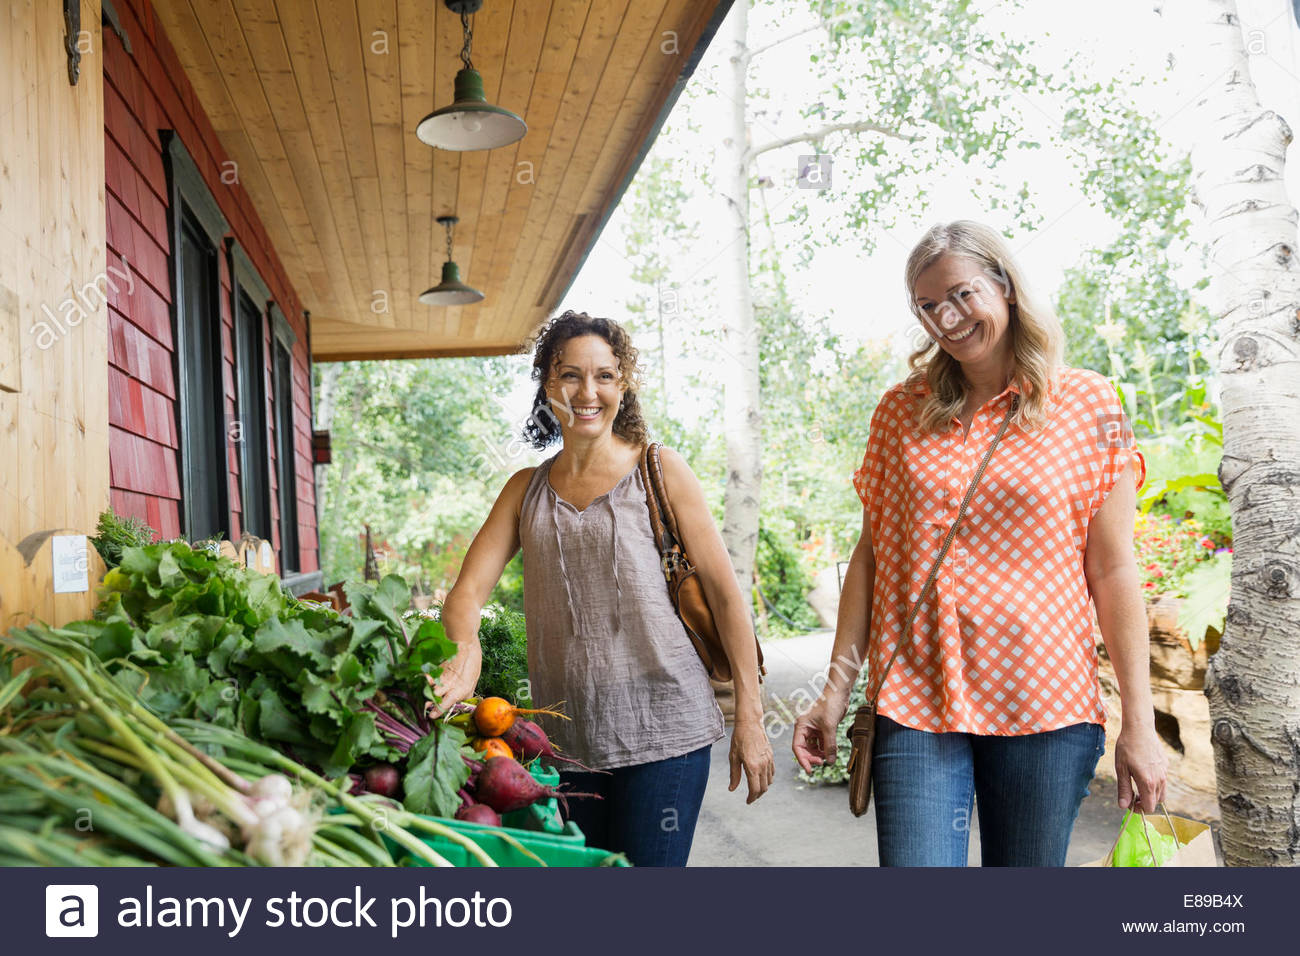 Smiling women shopping for produce outside market - Stock Image